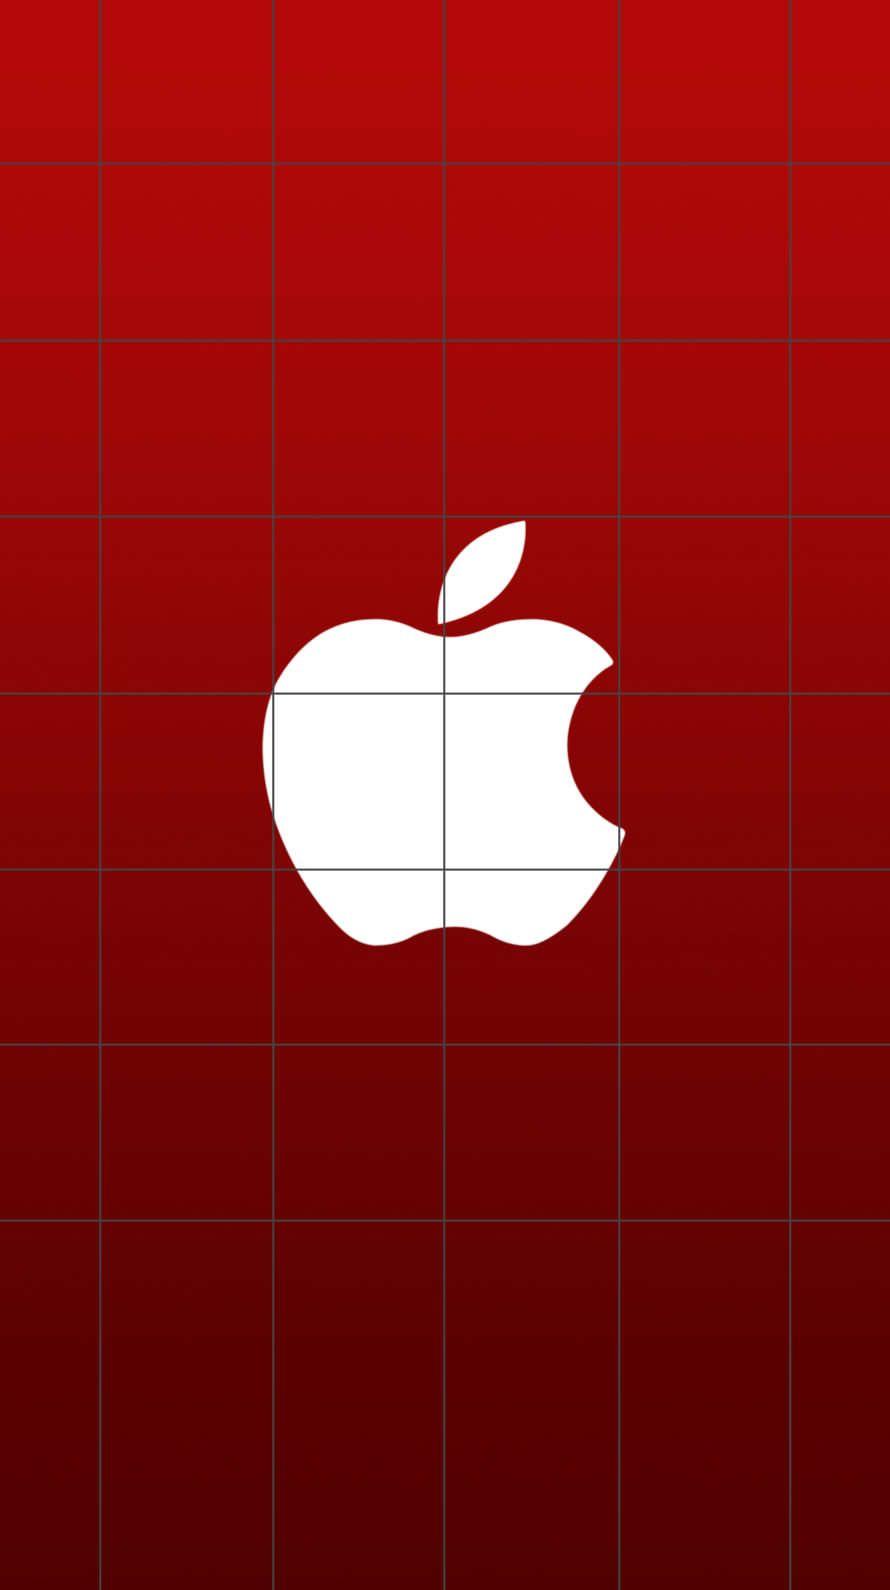 Fond D Ecran Gratuit Apple Logo Wallpaper Iphone Apple Wallpaper Iphone Abstract Iphone Wallpaper